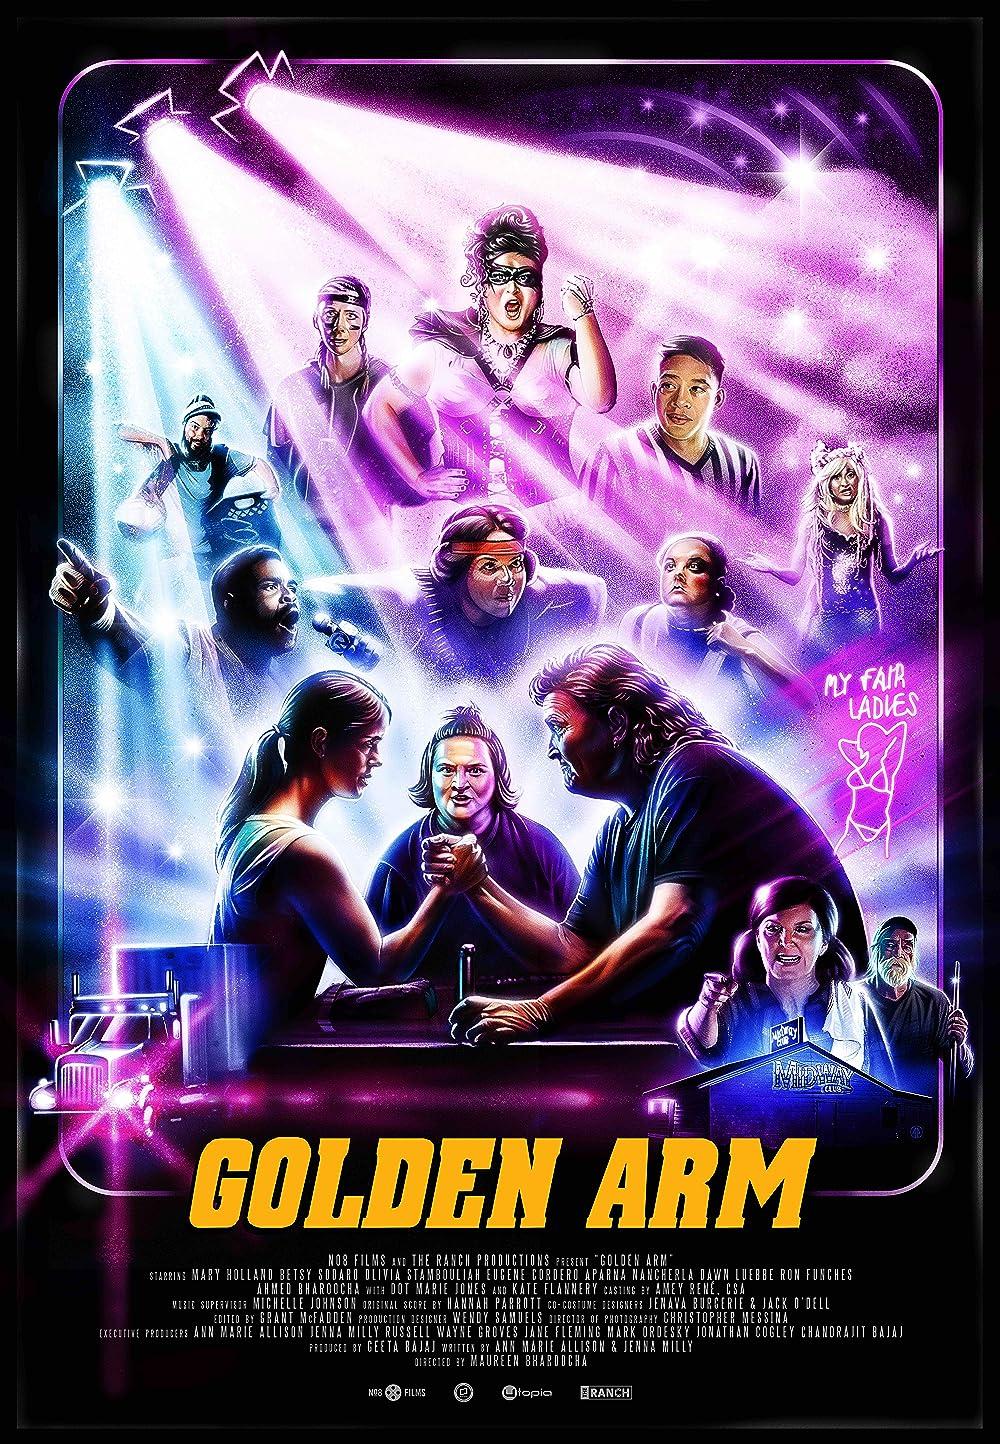 Golden Arm 2021 English 1080p HDRip 1.4GB Download